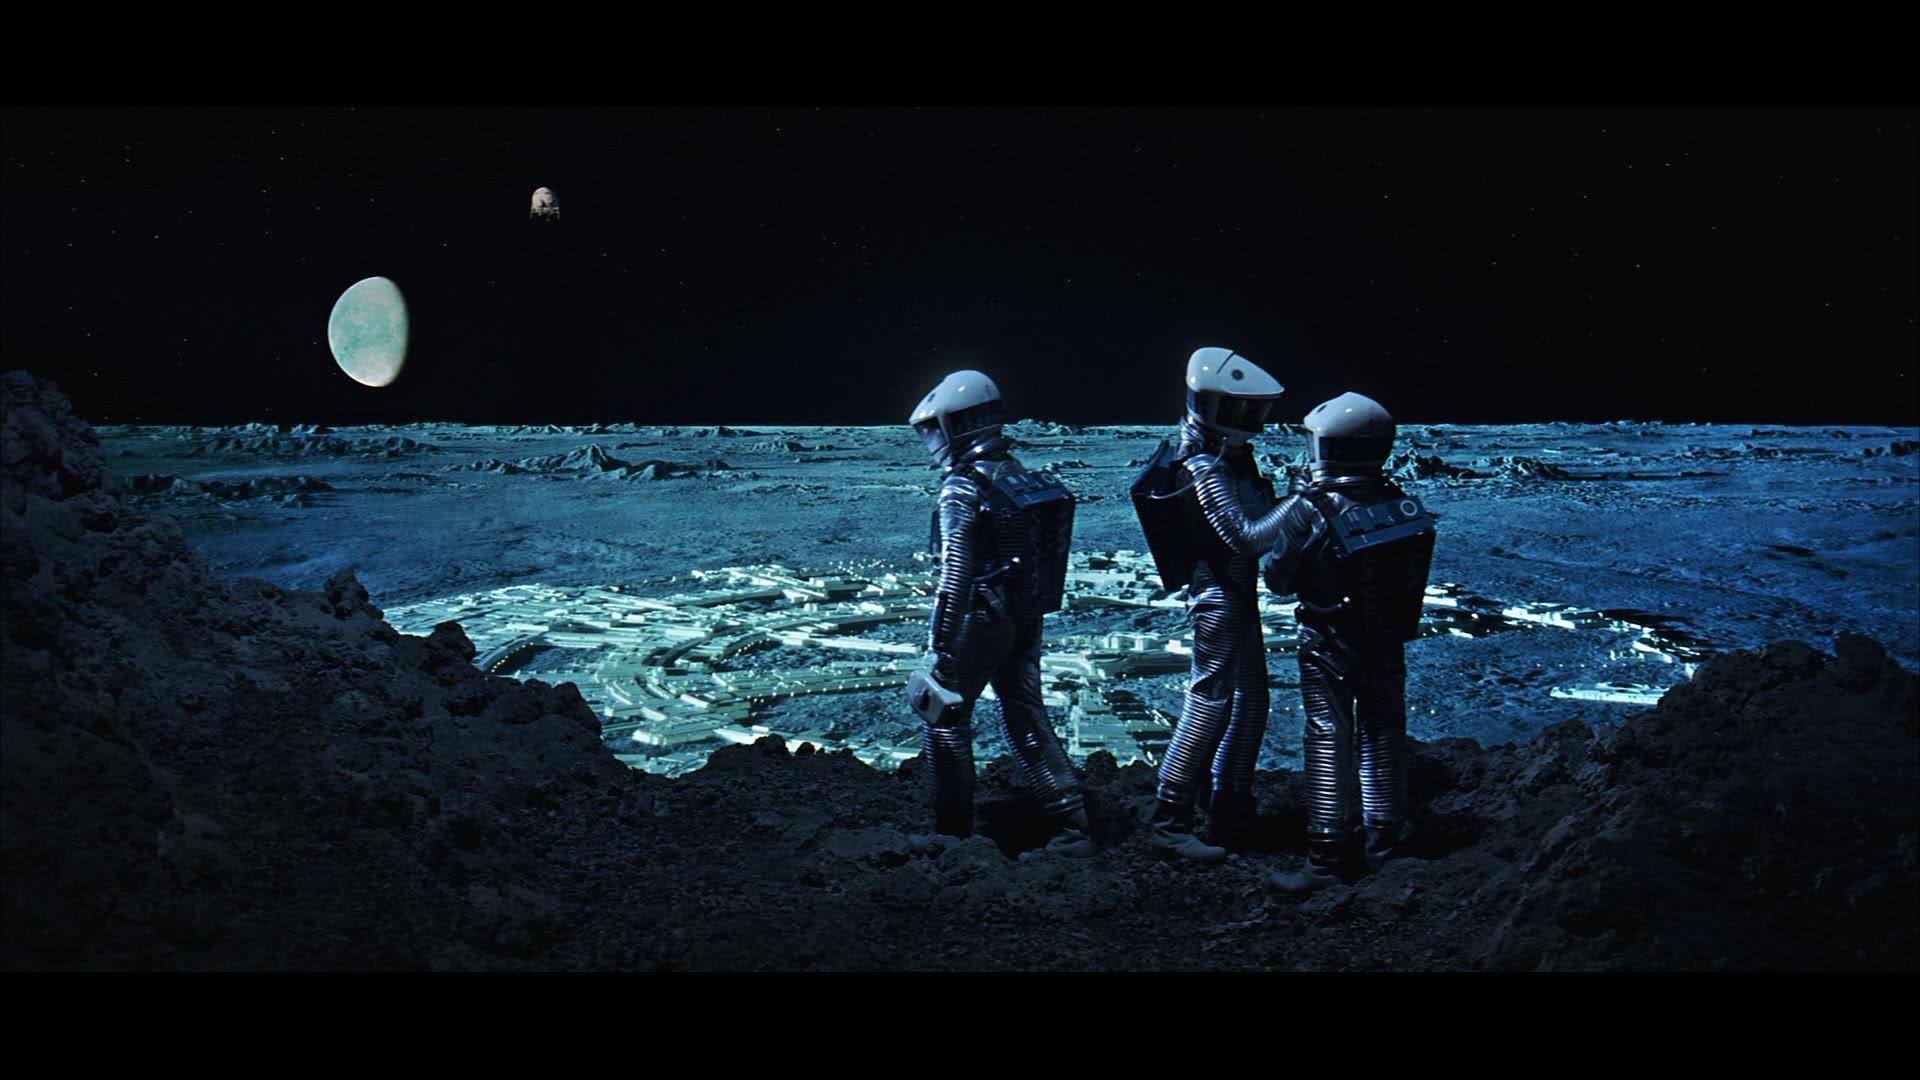 Science Fiction Wallpaper Hd Astronauts science wallpaper